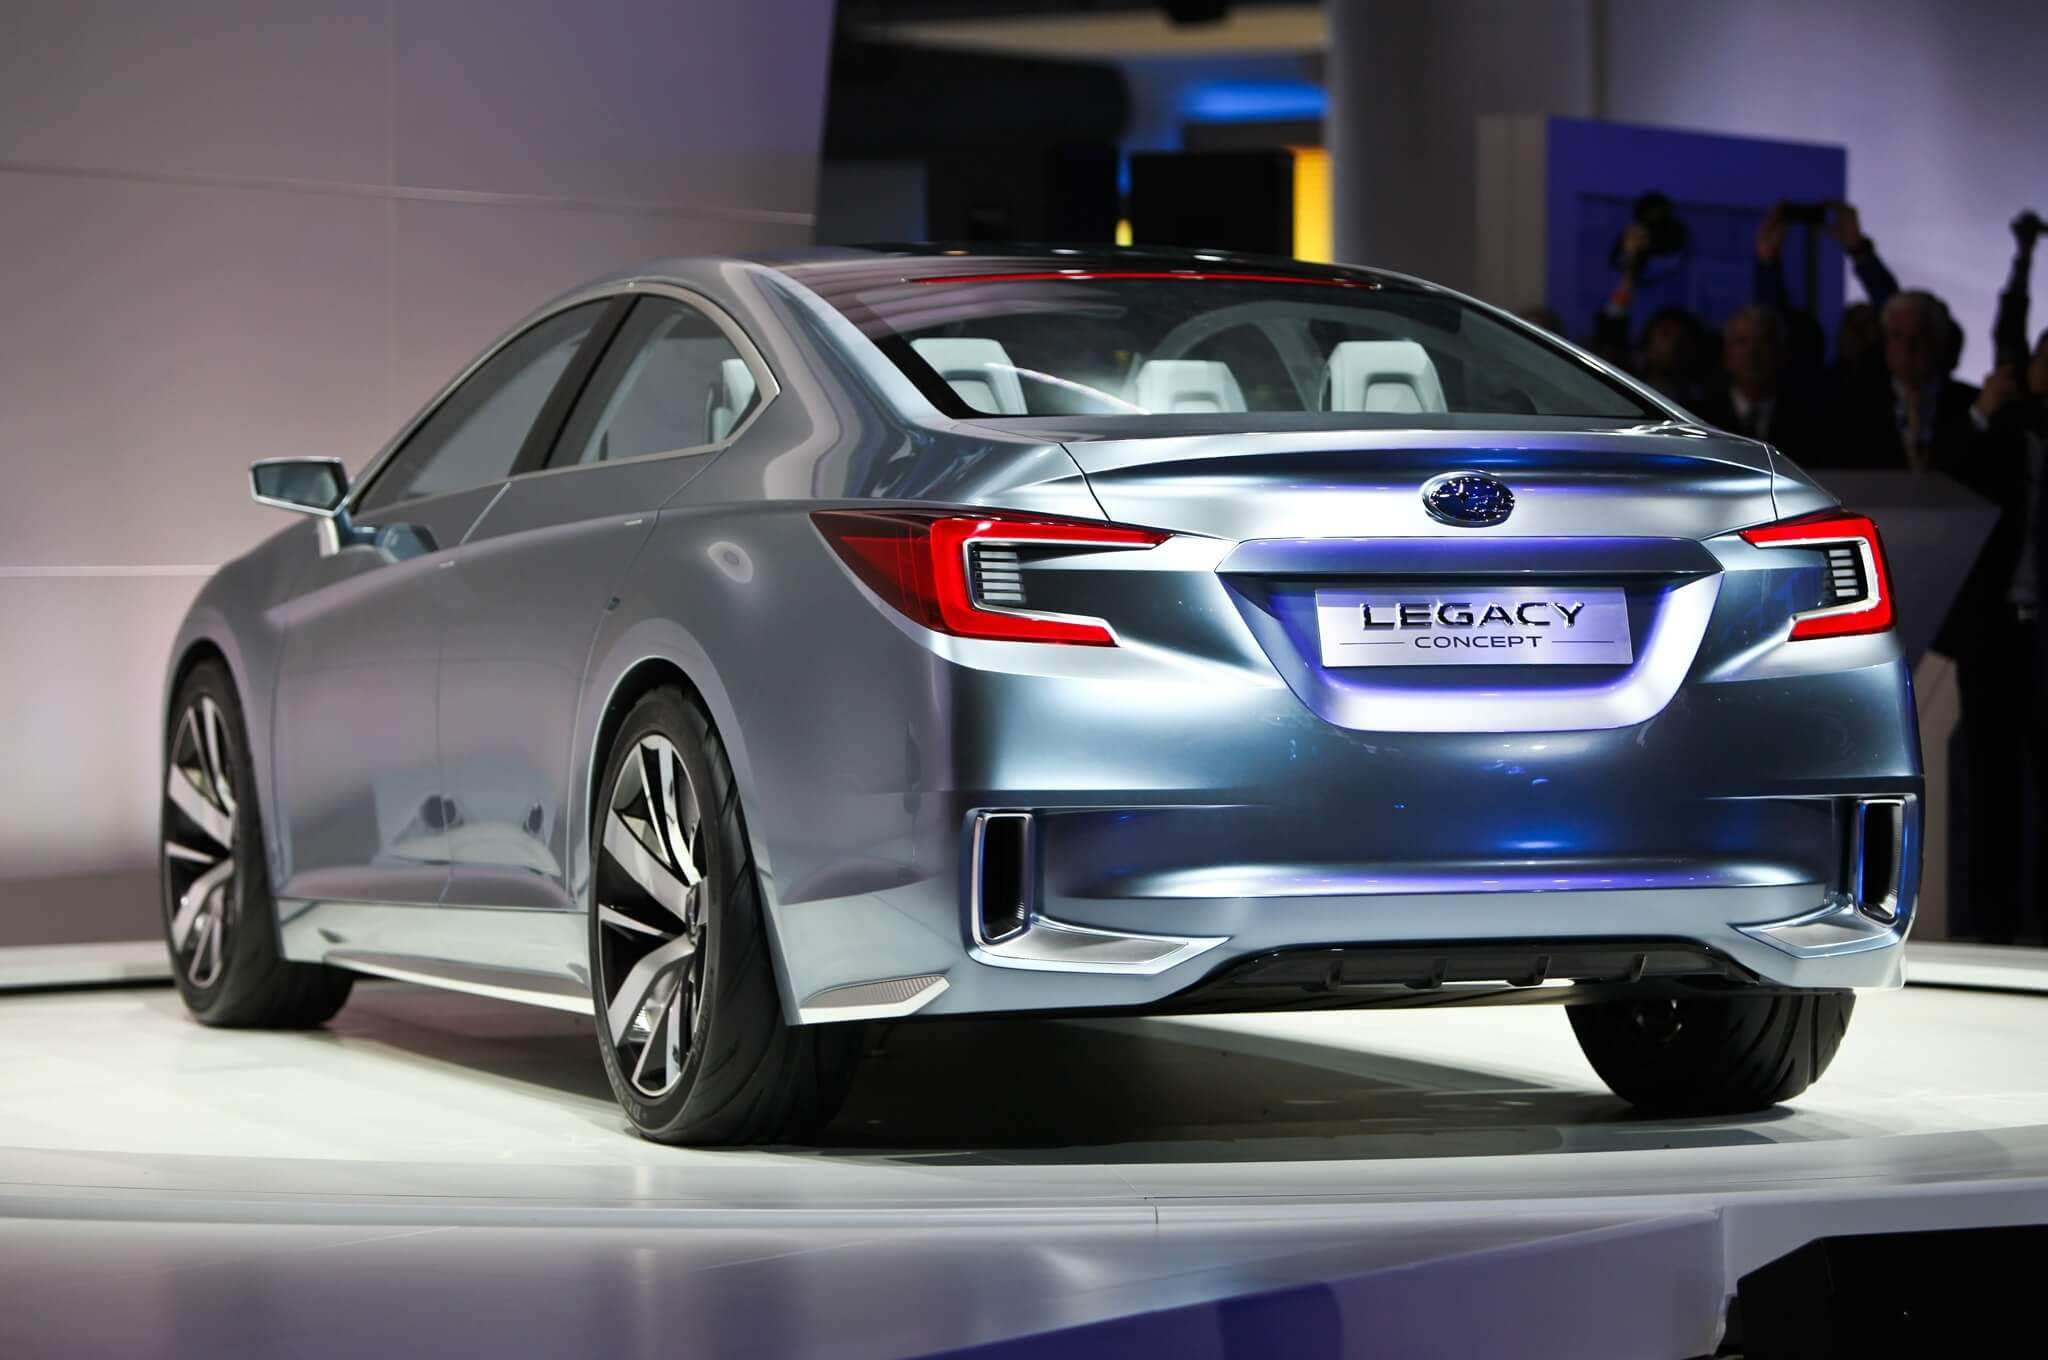 19 Concept of Subaru News 2020 Spy Shoot with Subaru News 2020